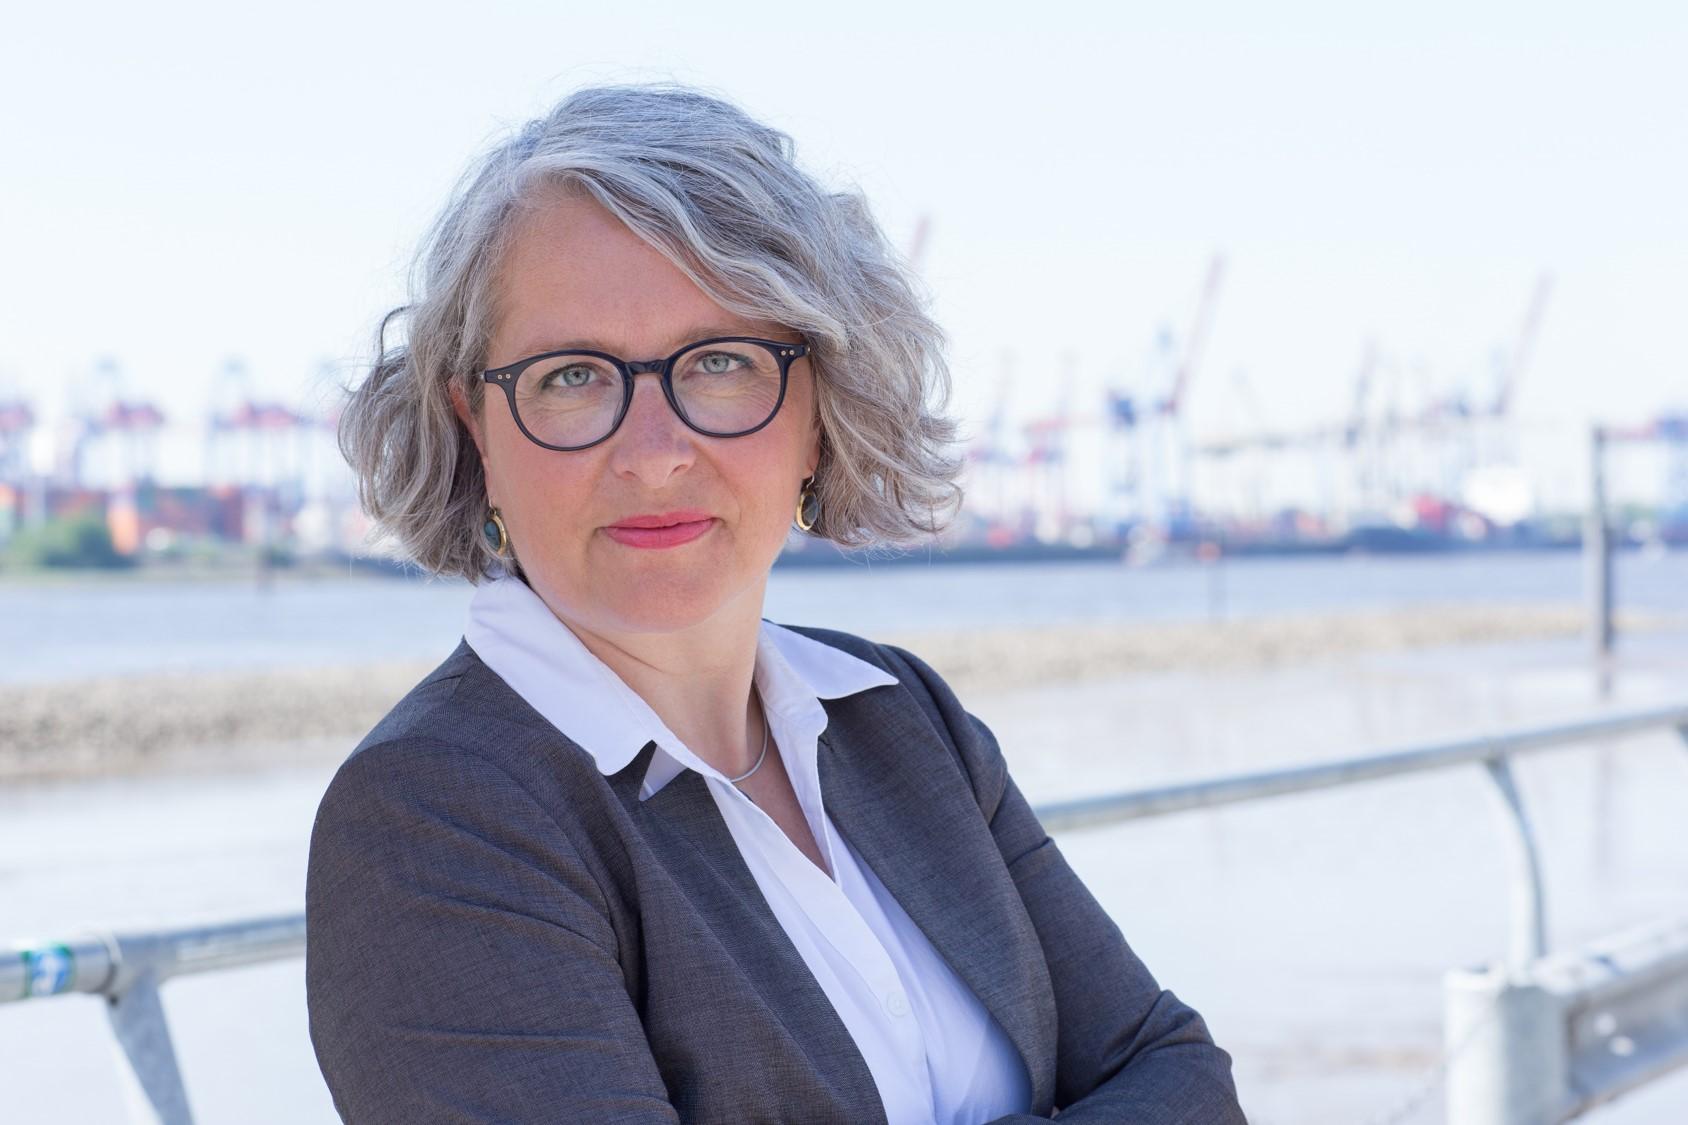 (c) Angela Pfeiffer